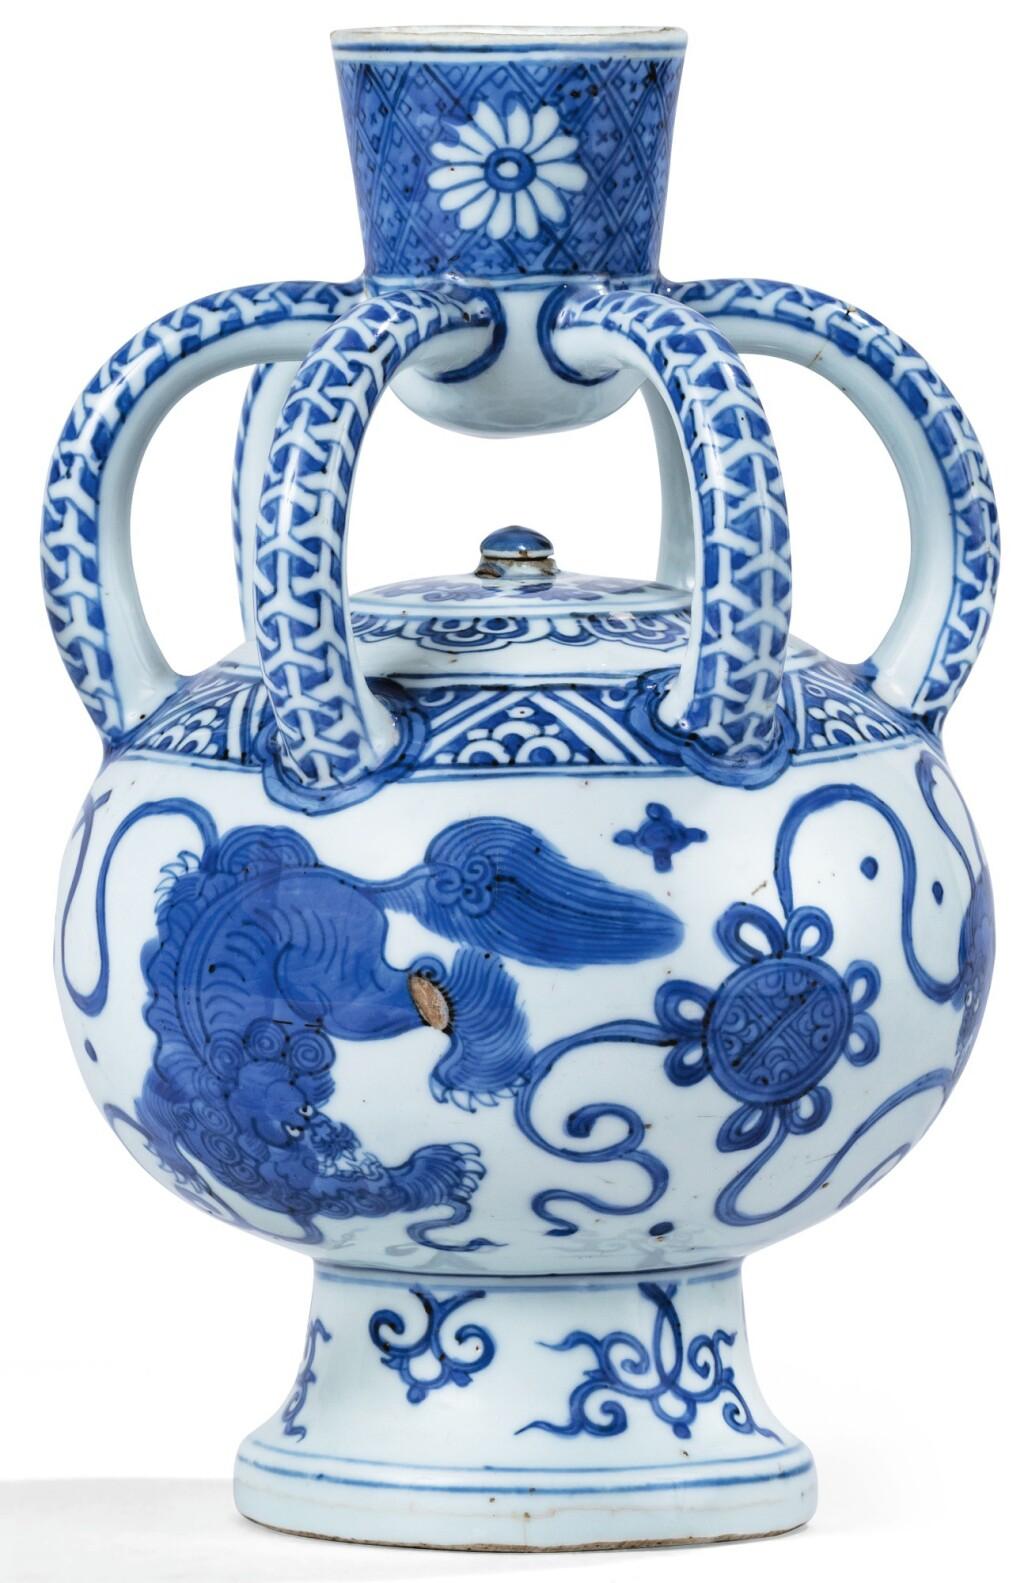 RARE ASPERSOIR EN PORCELAINE BLEU BLANC DYNASTIE MING, XVIE SIÈCLE | 明十六世紀 青花佛獅戲球紋花灑 | A rare blue and white 'Buddhist Lion' water sprinkler, Ming Dynasty, 16th century